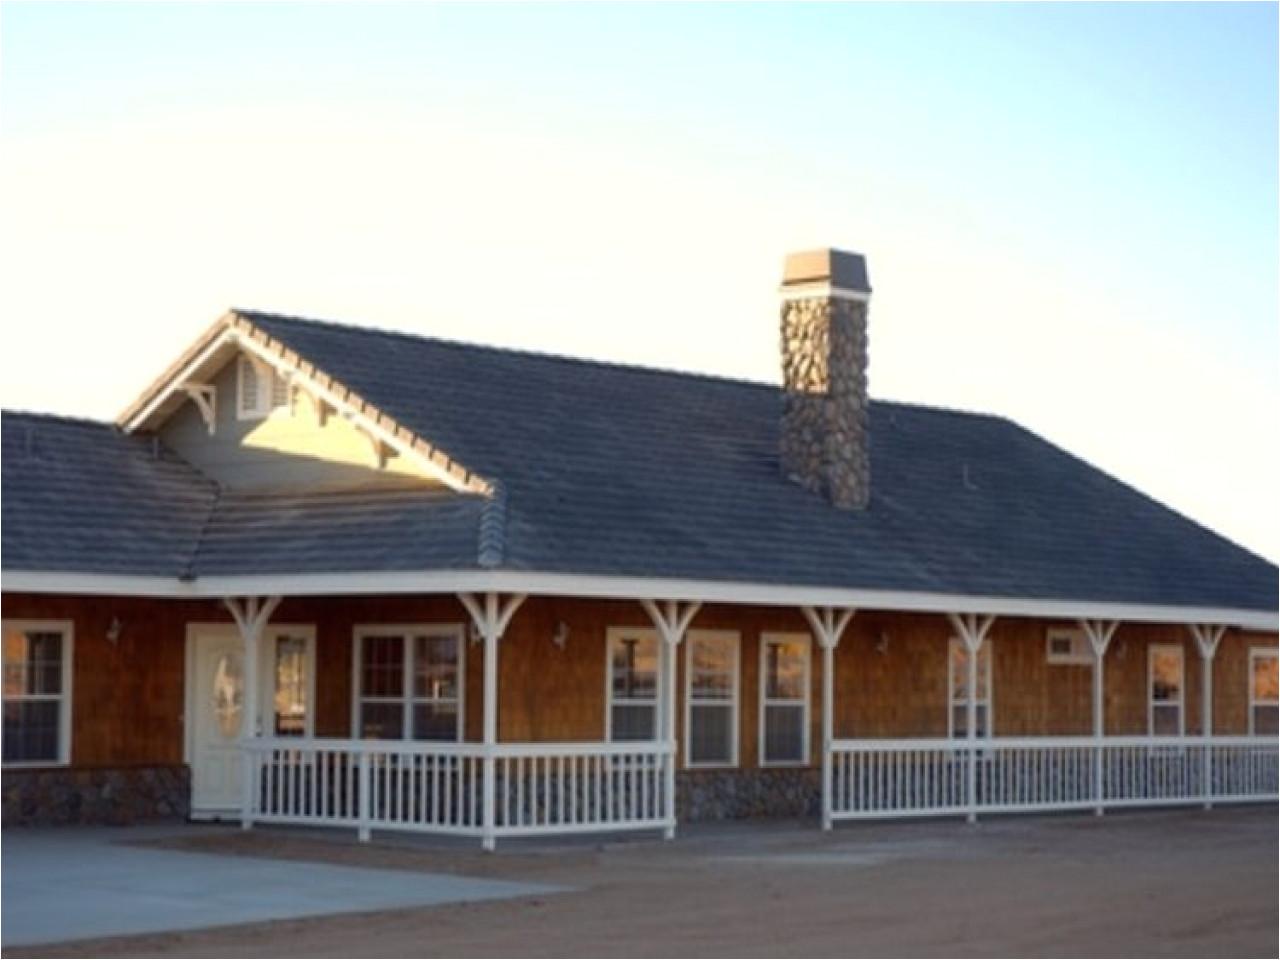 fcfe7853cdc2fcb1 house plans ranch style home unique ranch house plans